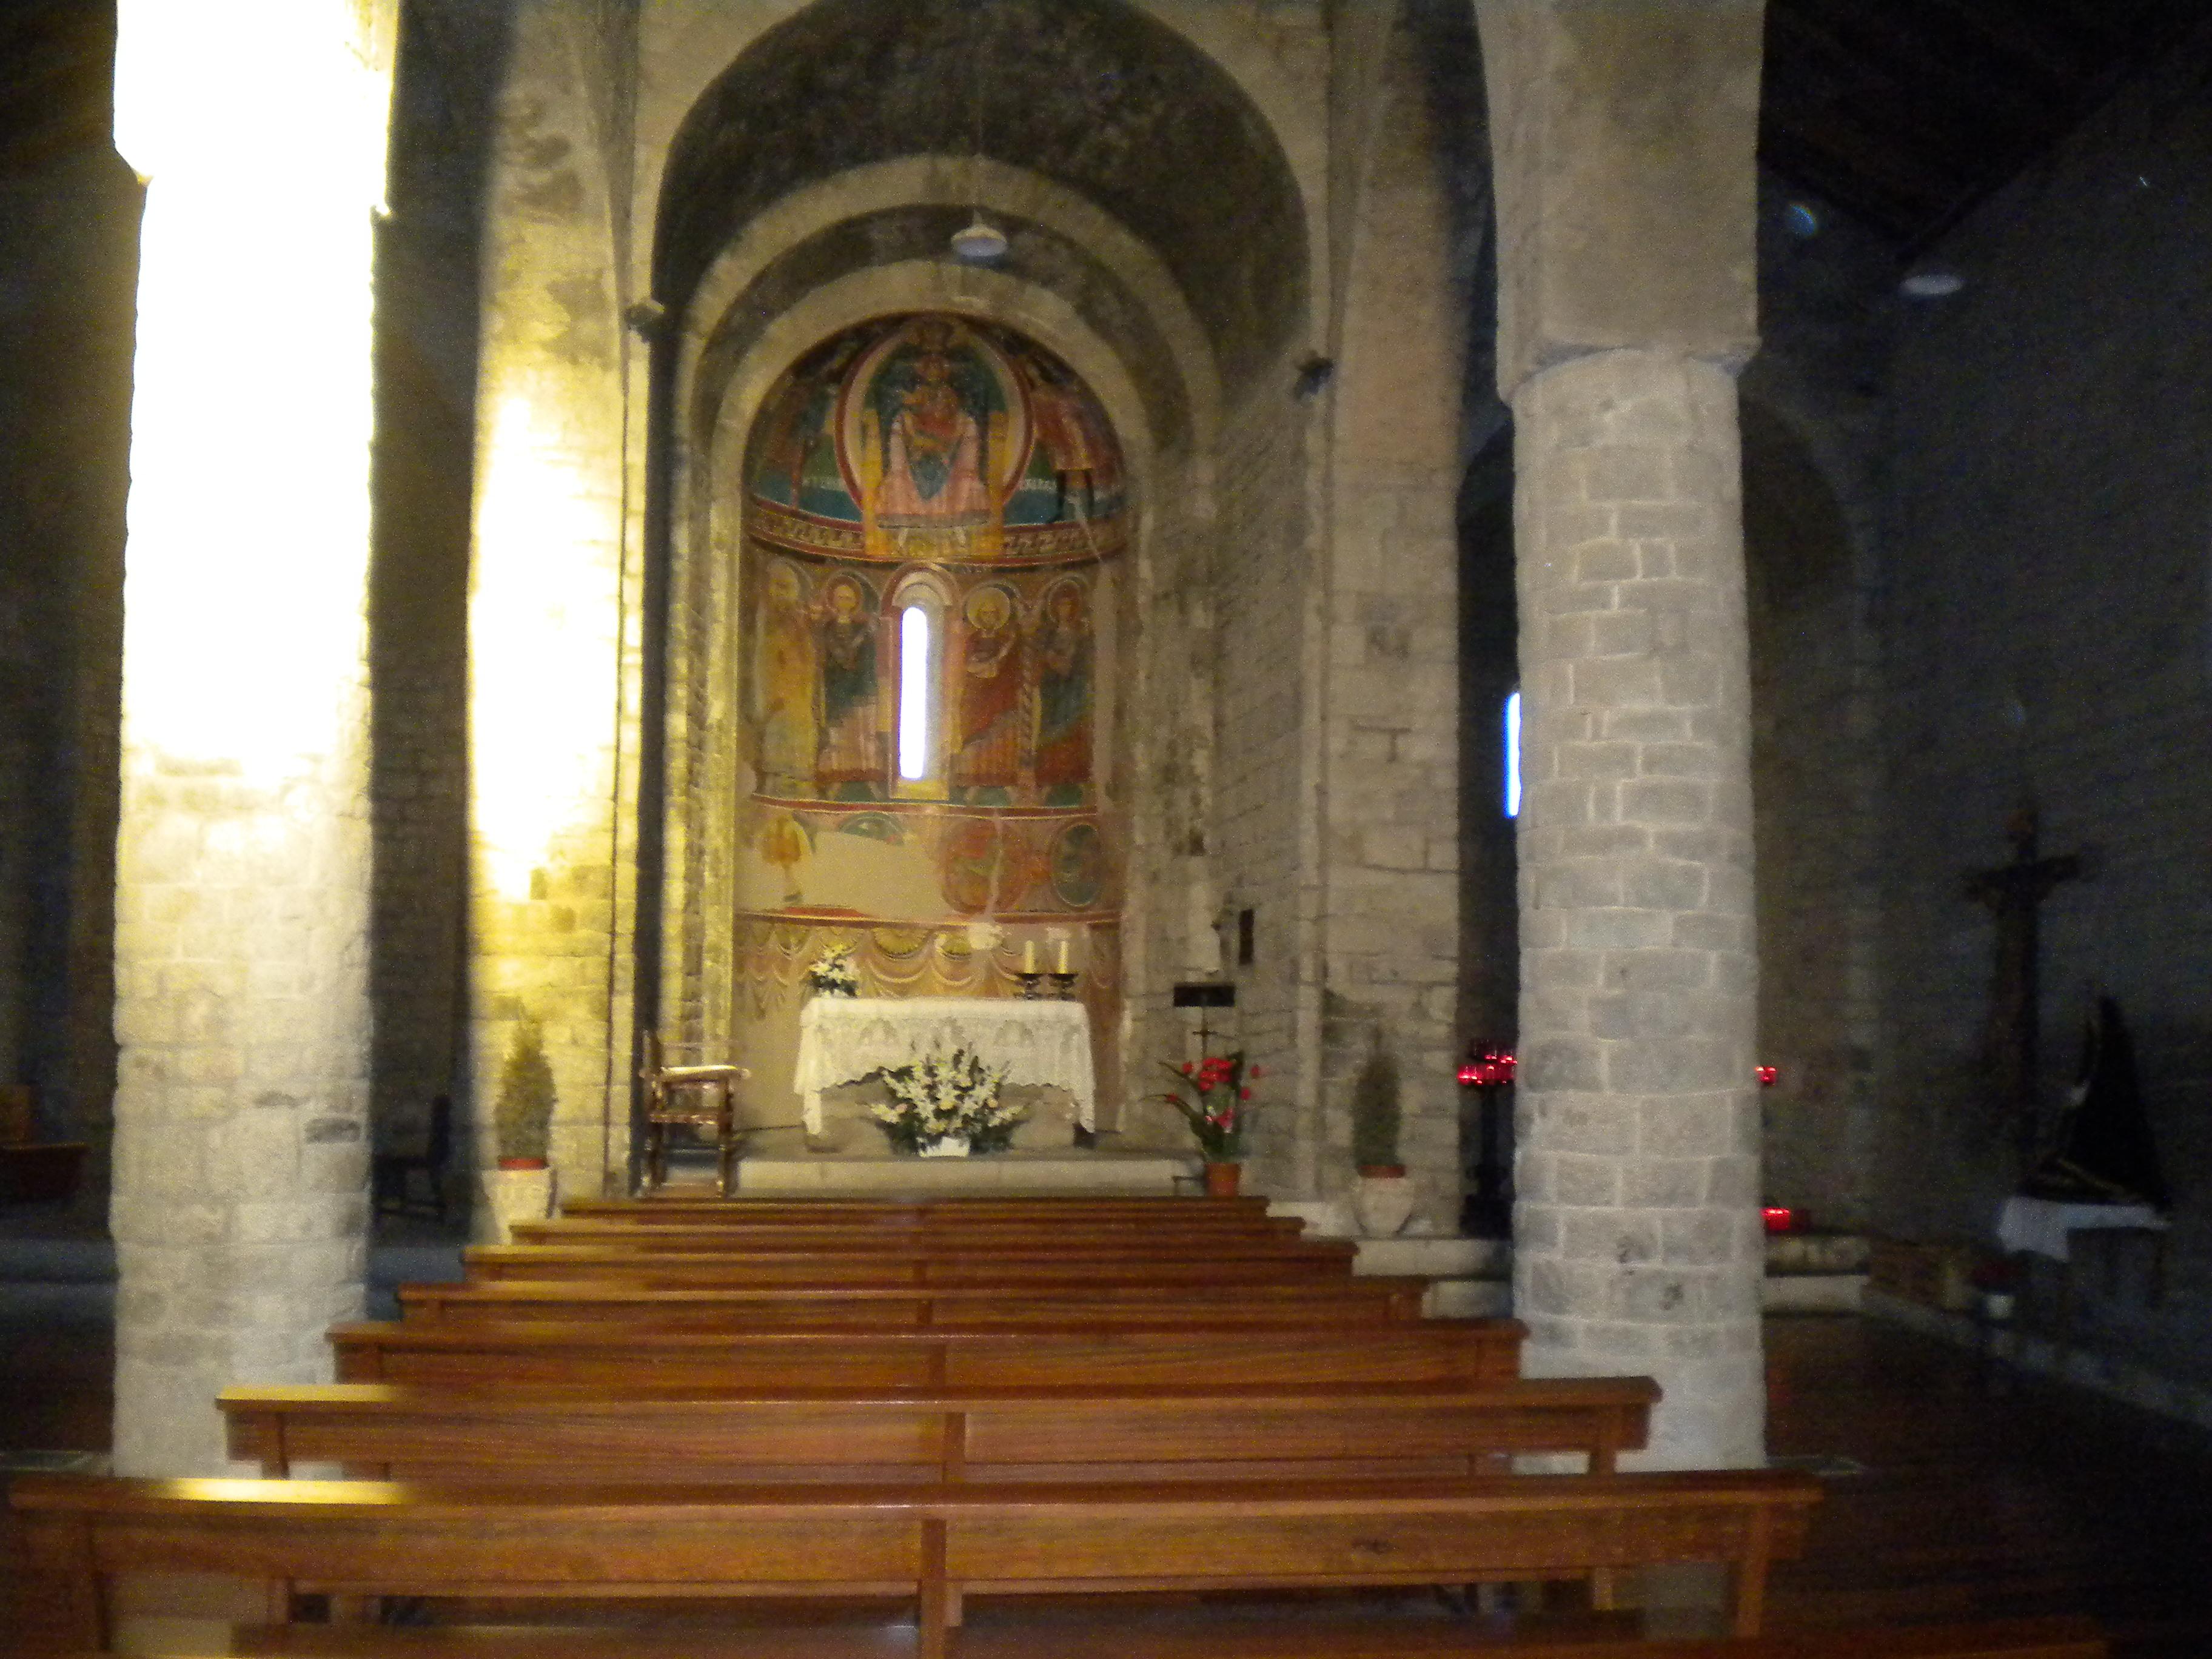 File:Interior de Santa Maria de Taüll.jpg - Wikimedia Commons